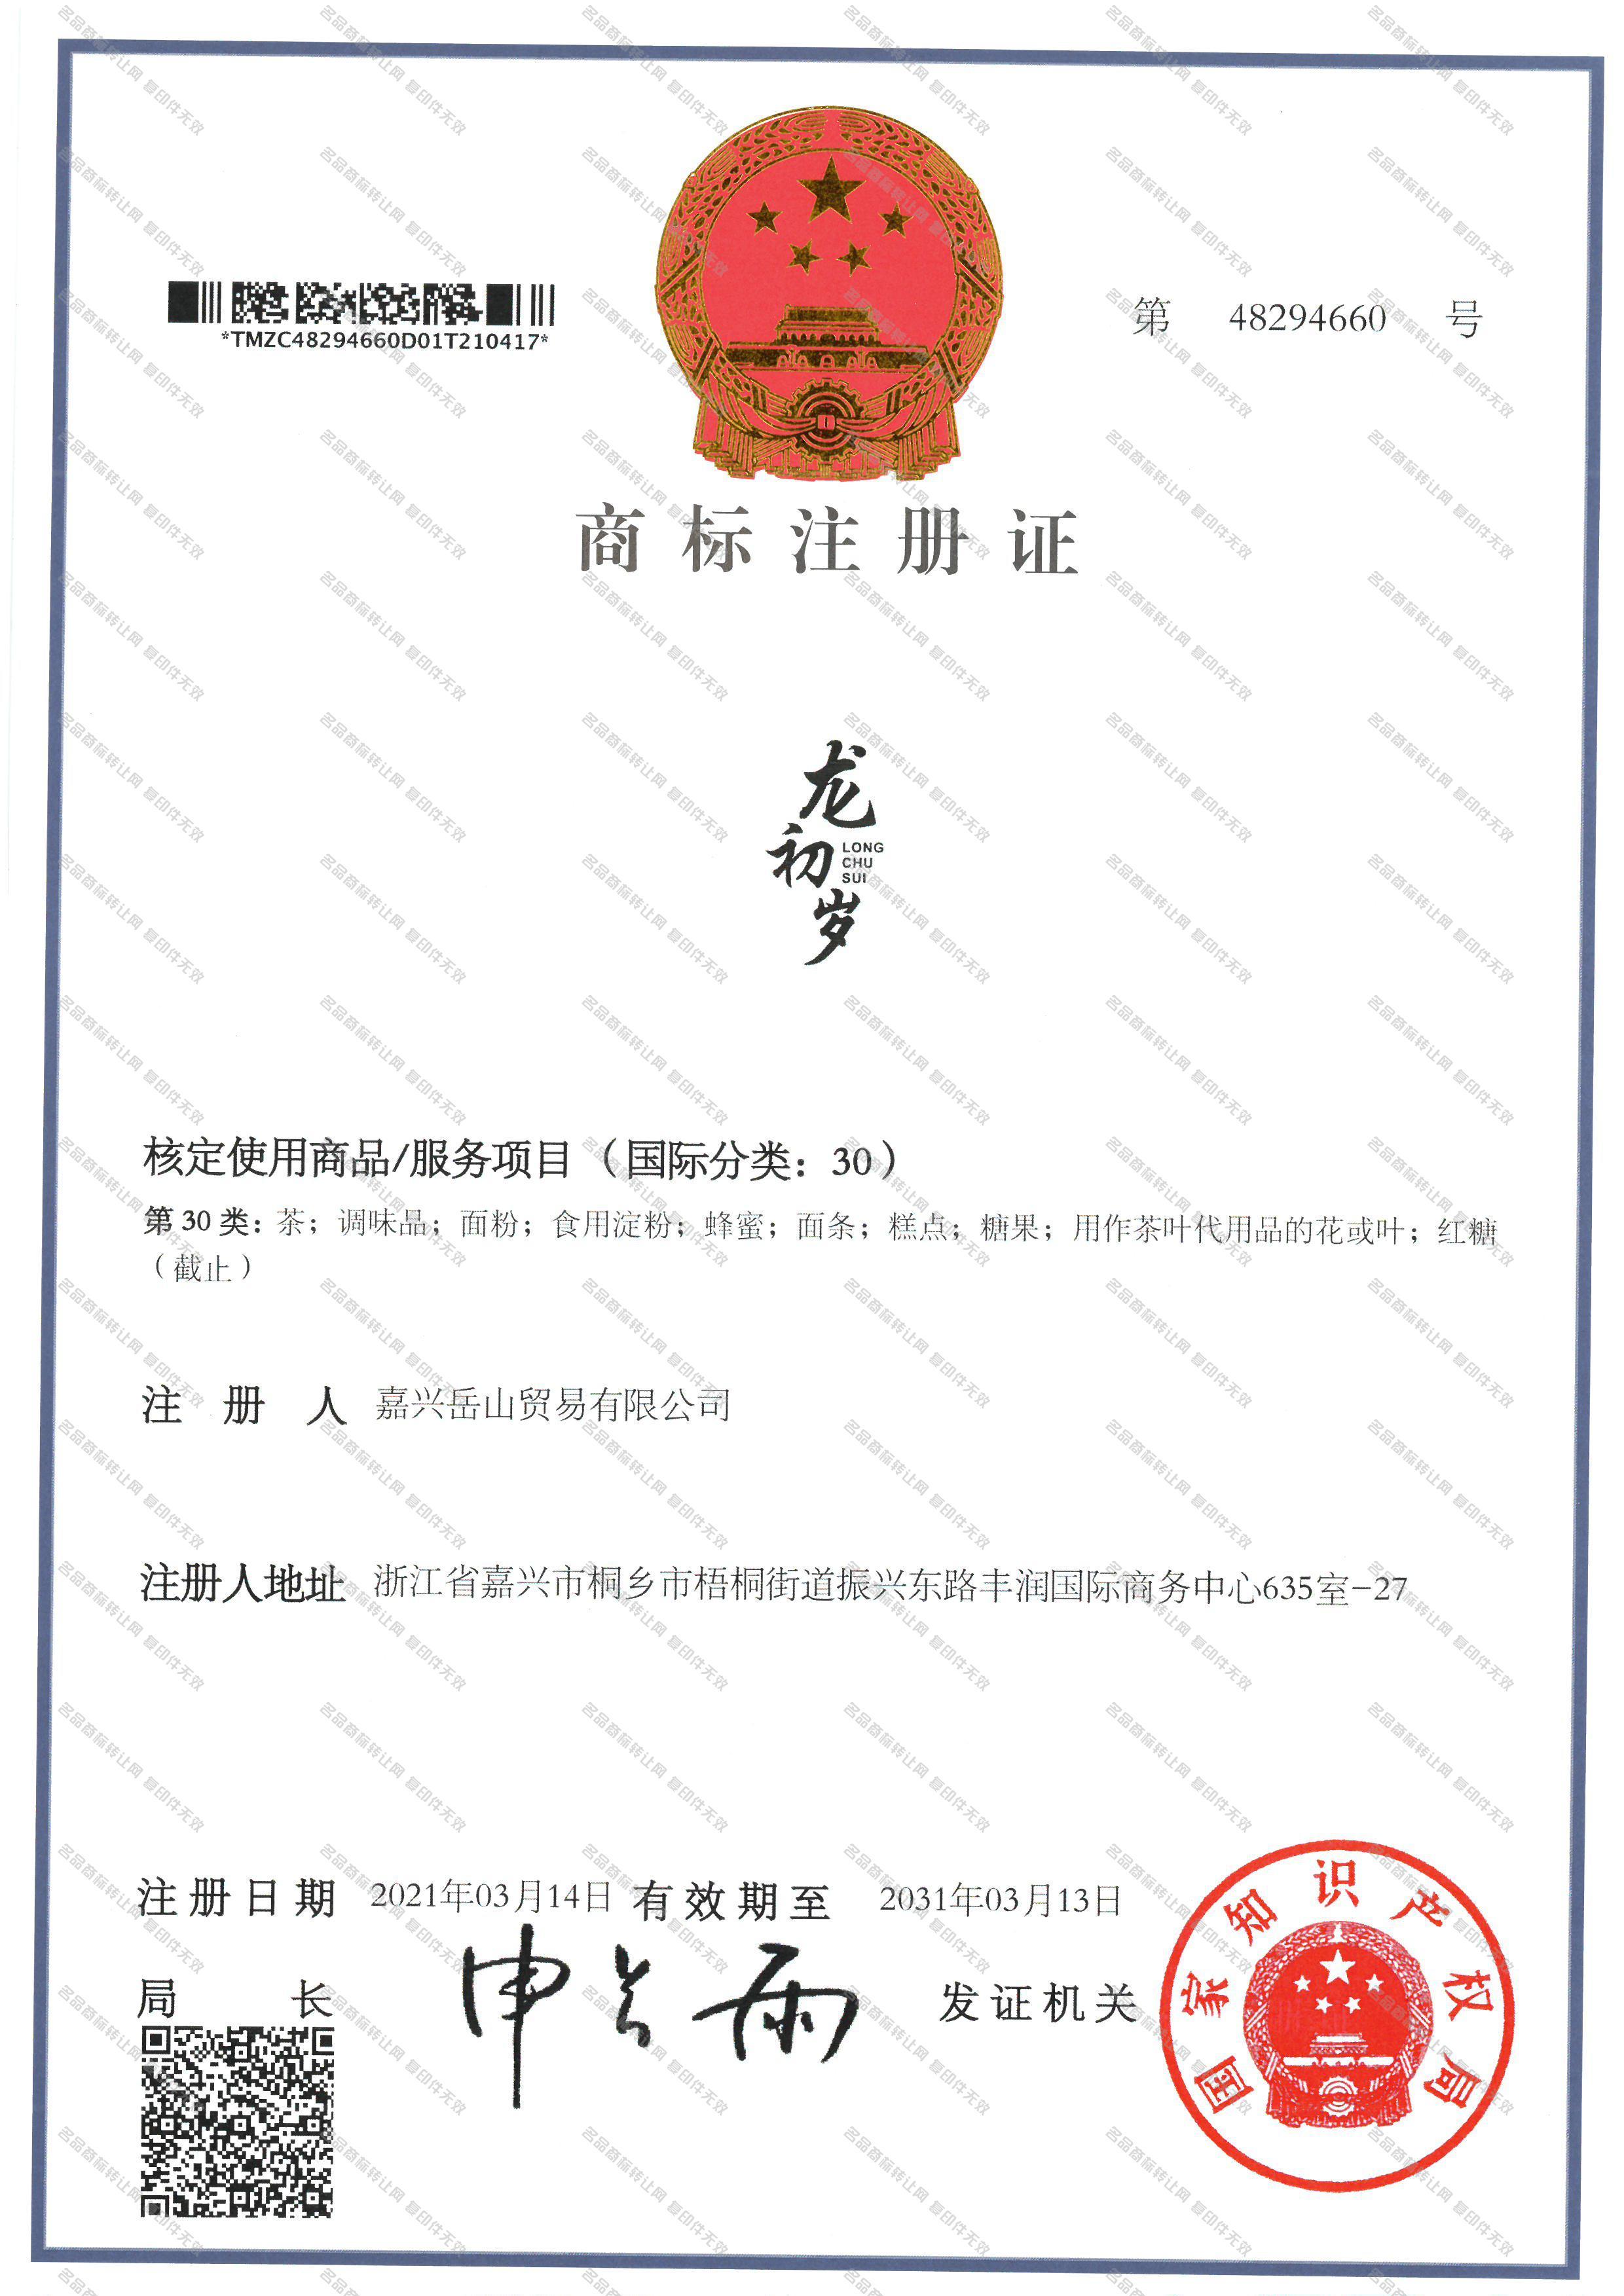 龙初岁;LONGCHUSUI注册证